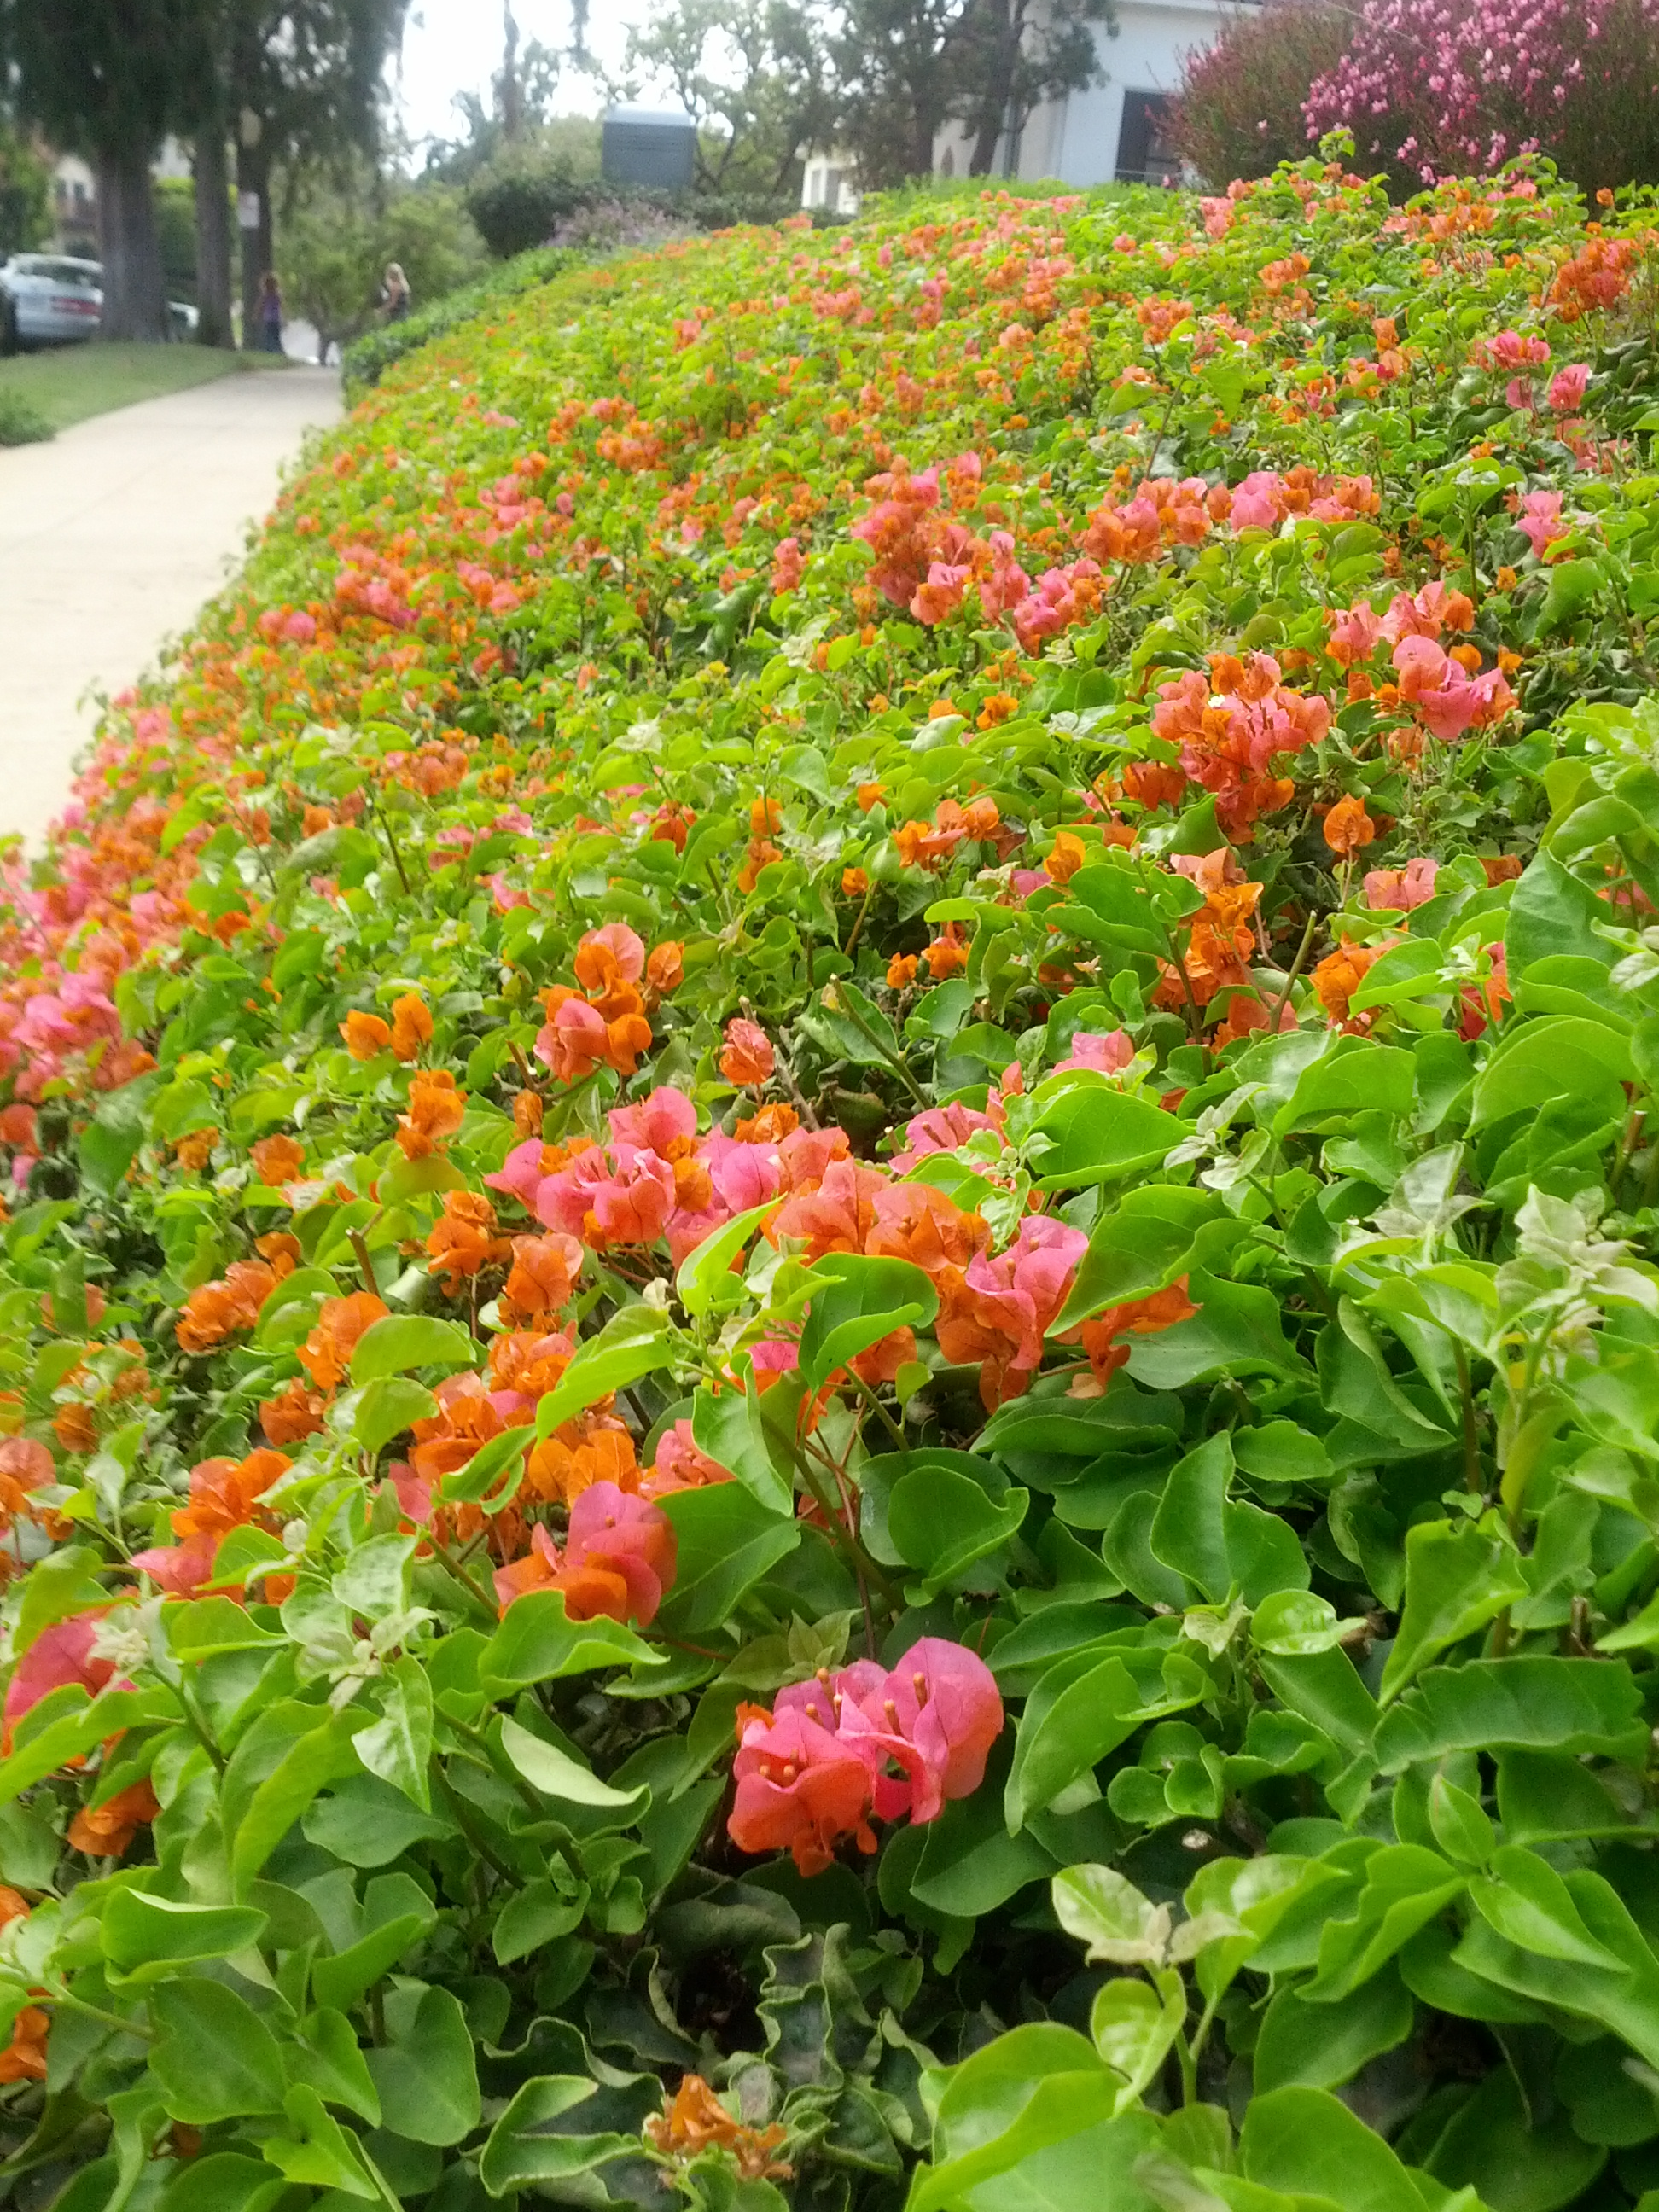 Bougainvillea: a Love-Hate Relationship – The Smarter Gardener